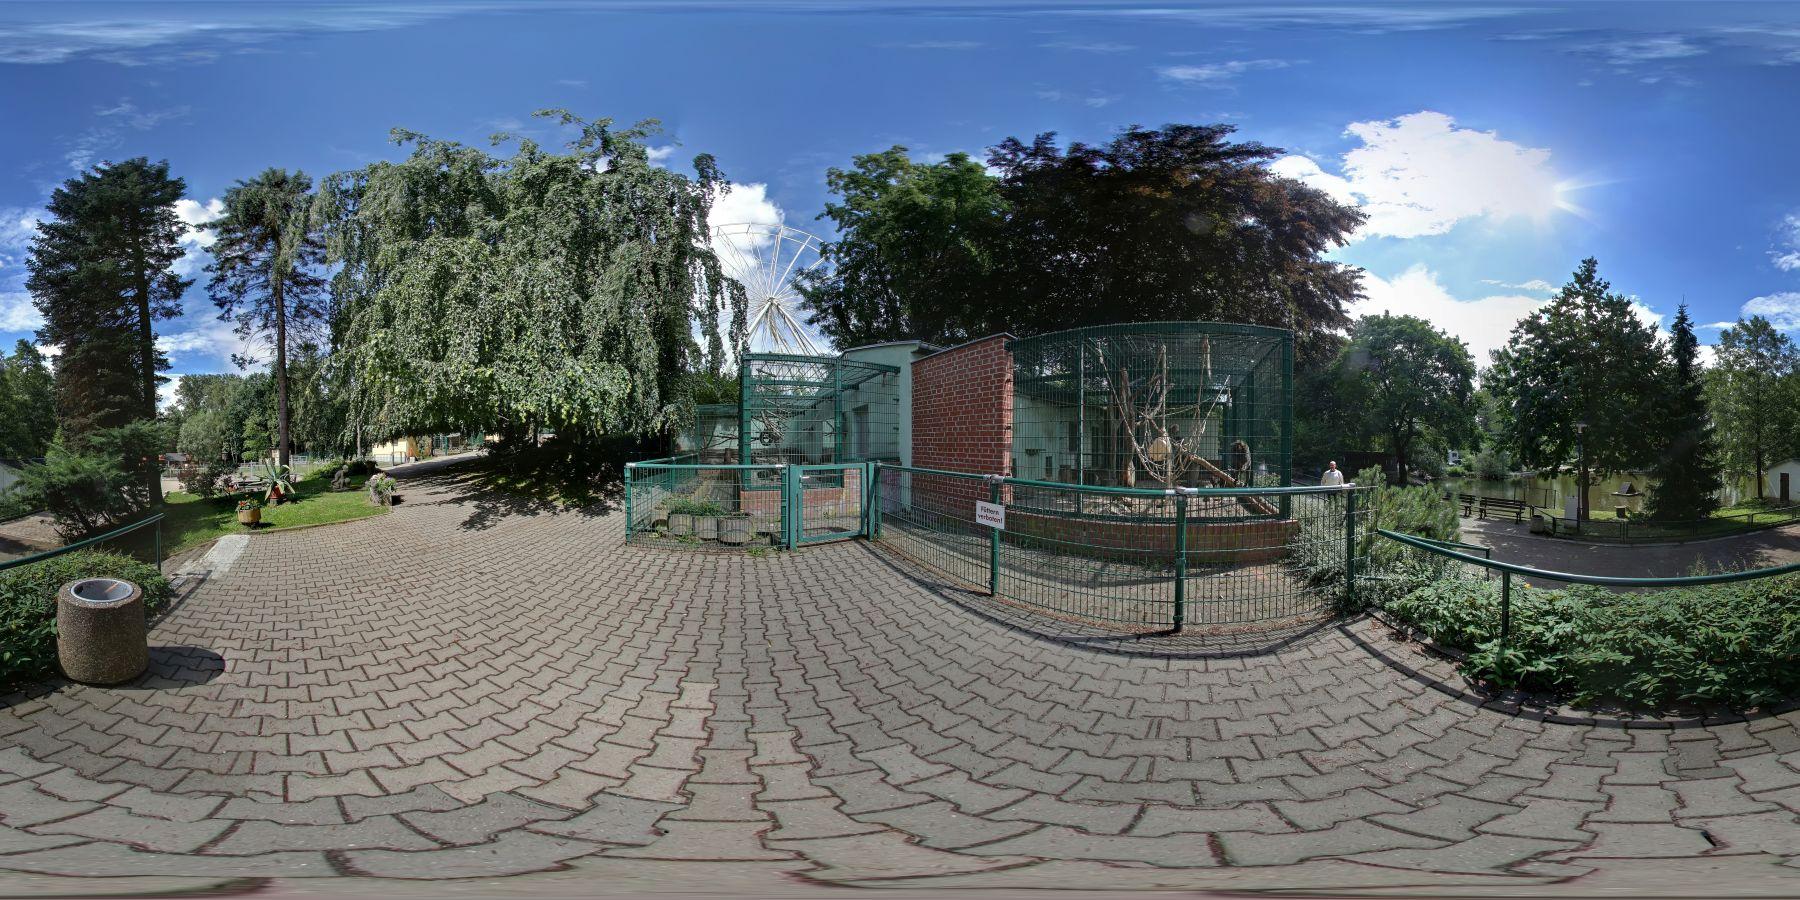 Tierpark Limbach Oberfrohna